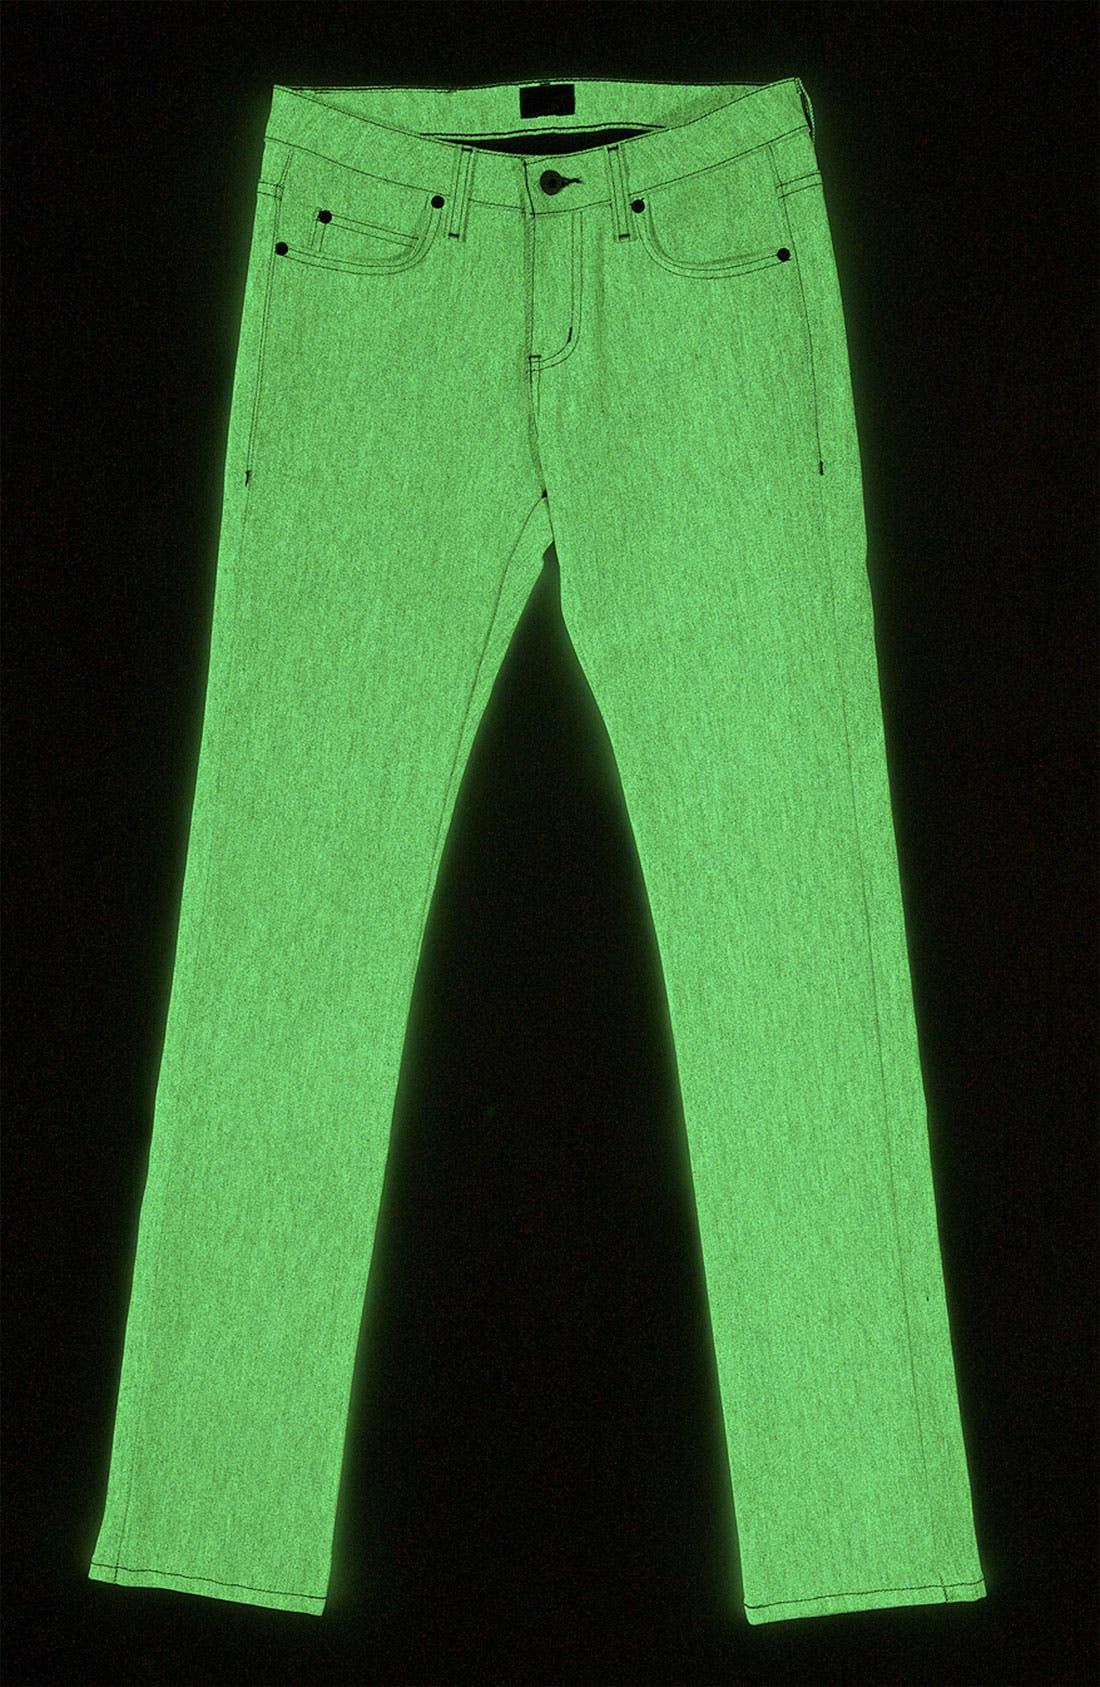 Alternate Image 2  - Naked & Famous Denim 'Skinny Guy' Slim Straight Leg Jeans (Grey Glow In The Dark)